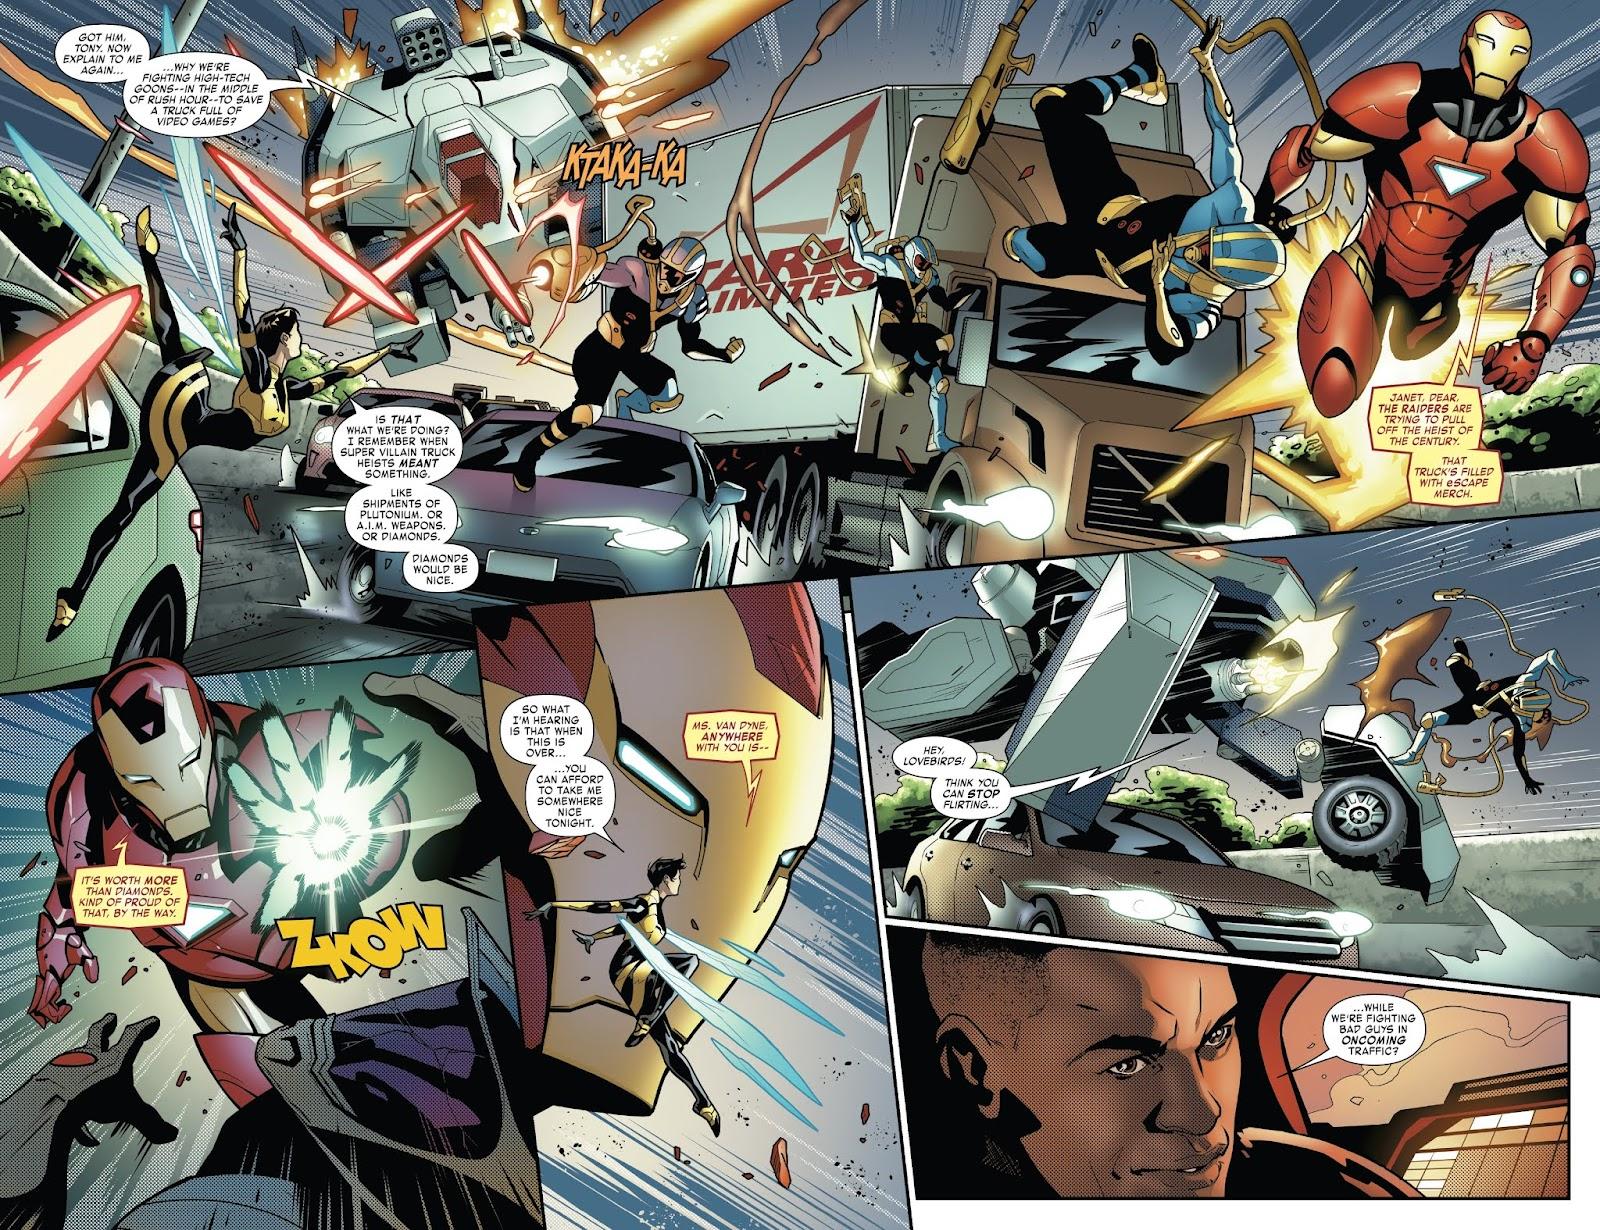 Read online Tony Stark: Iron Man comic -  Issue #6 - 5